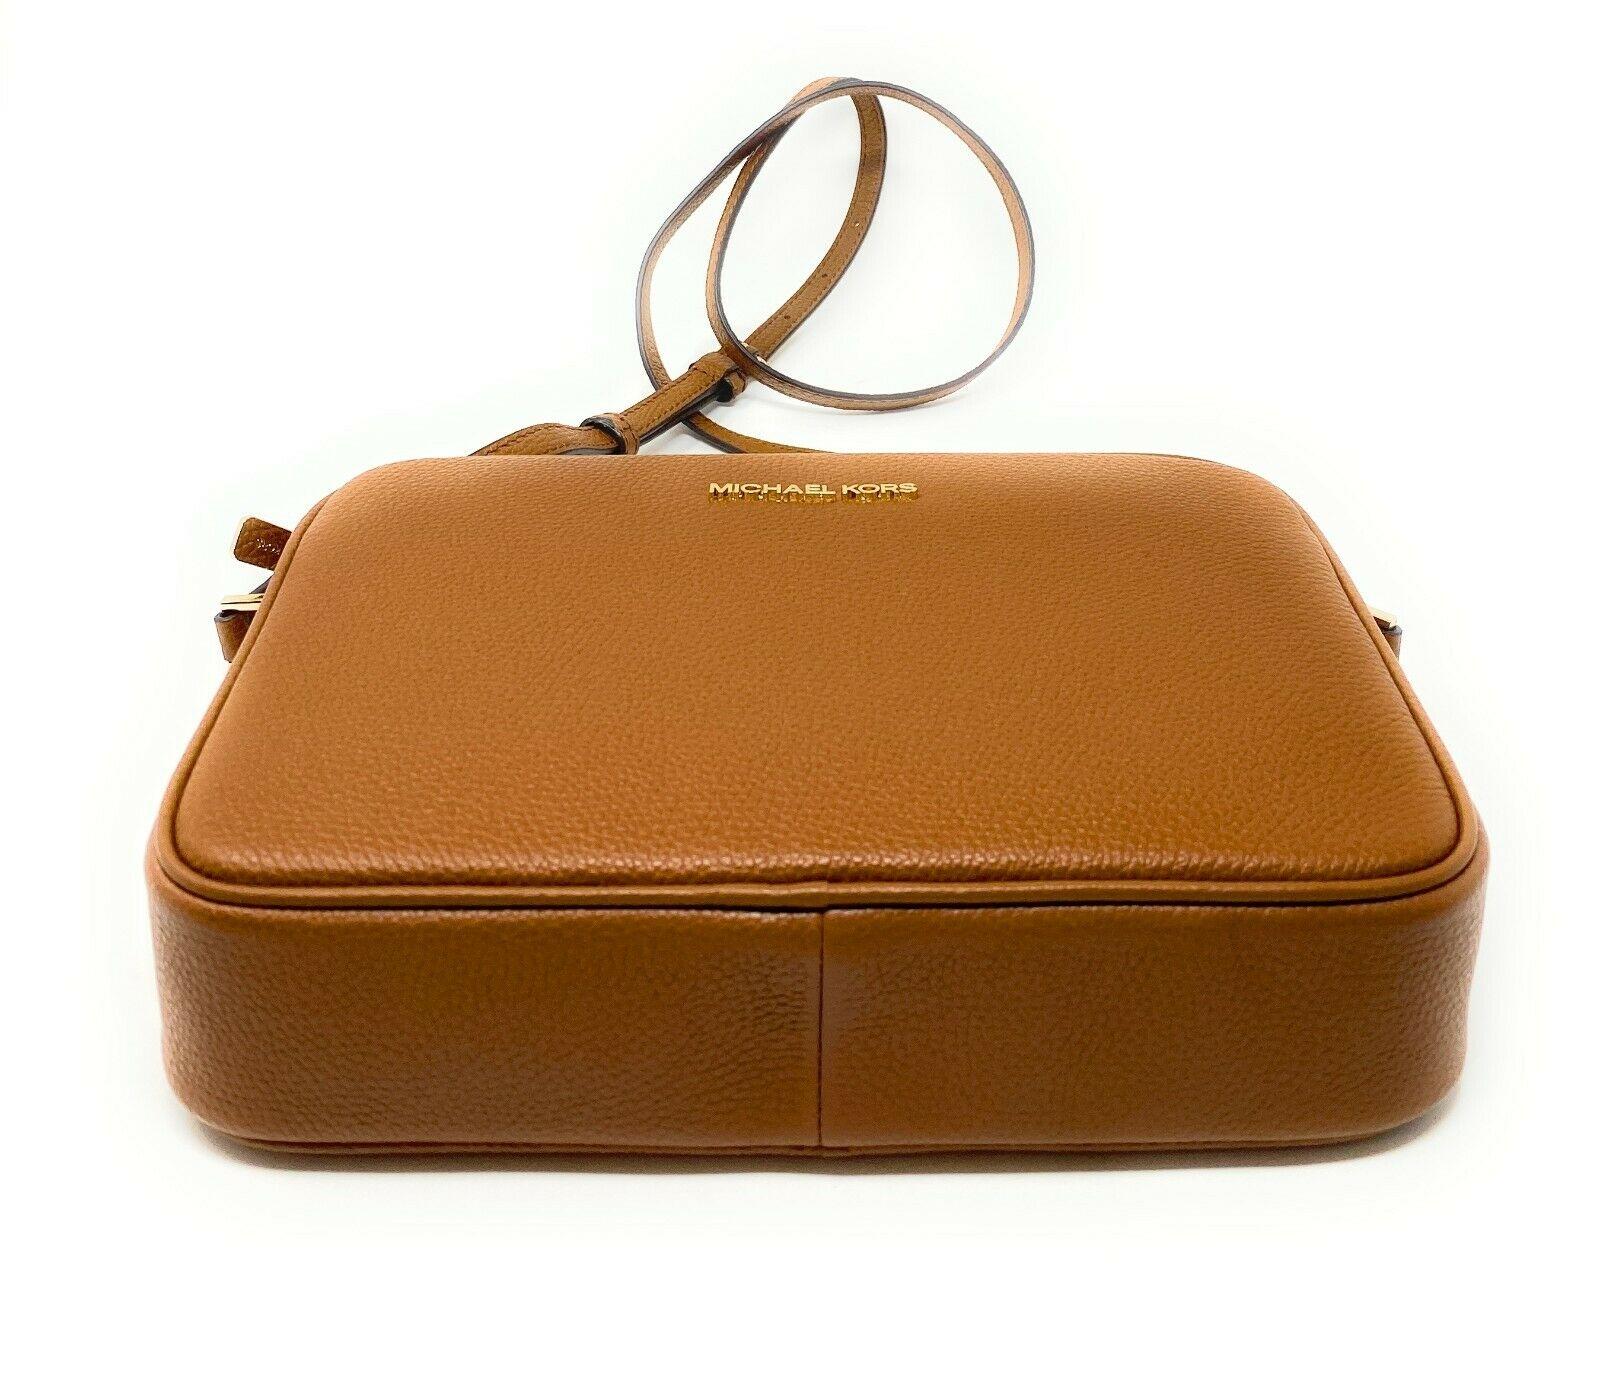 thumbnail 36 - Michael Kors Jet Set Item Large East West Crossbody Chain Handbag Clutch $298